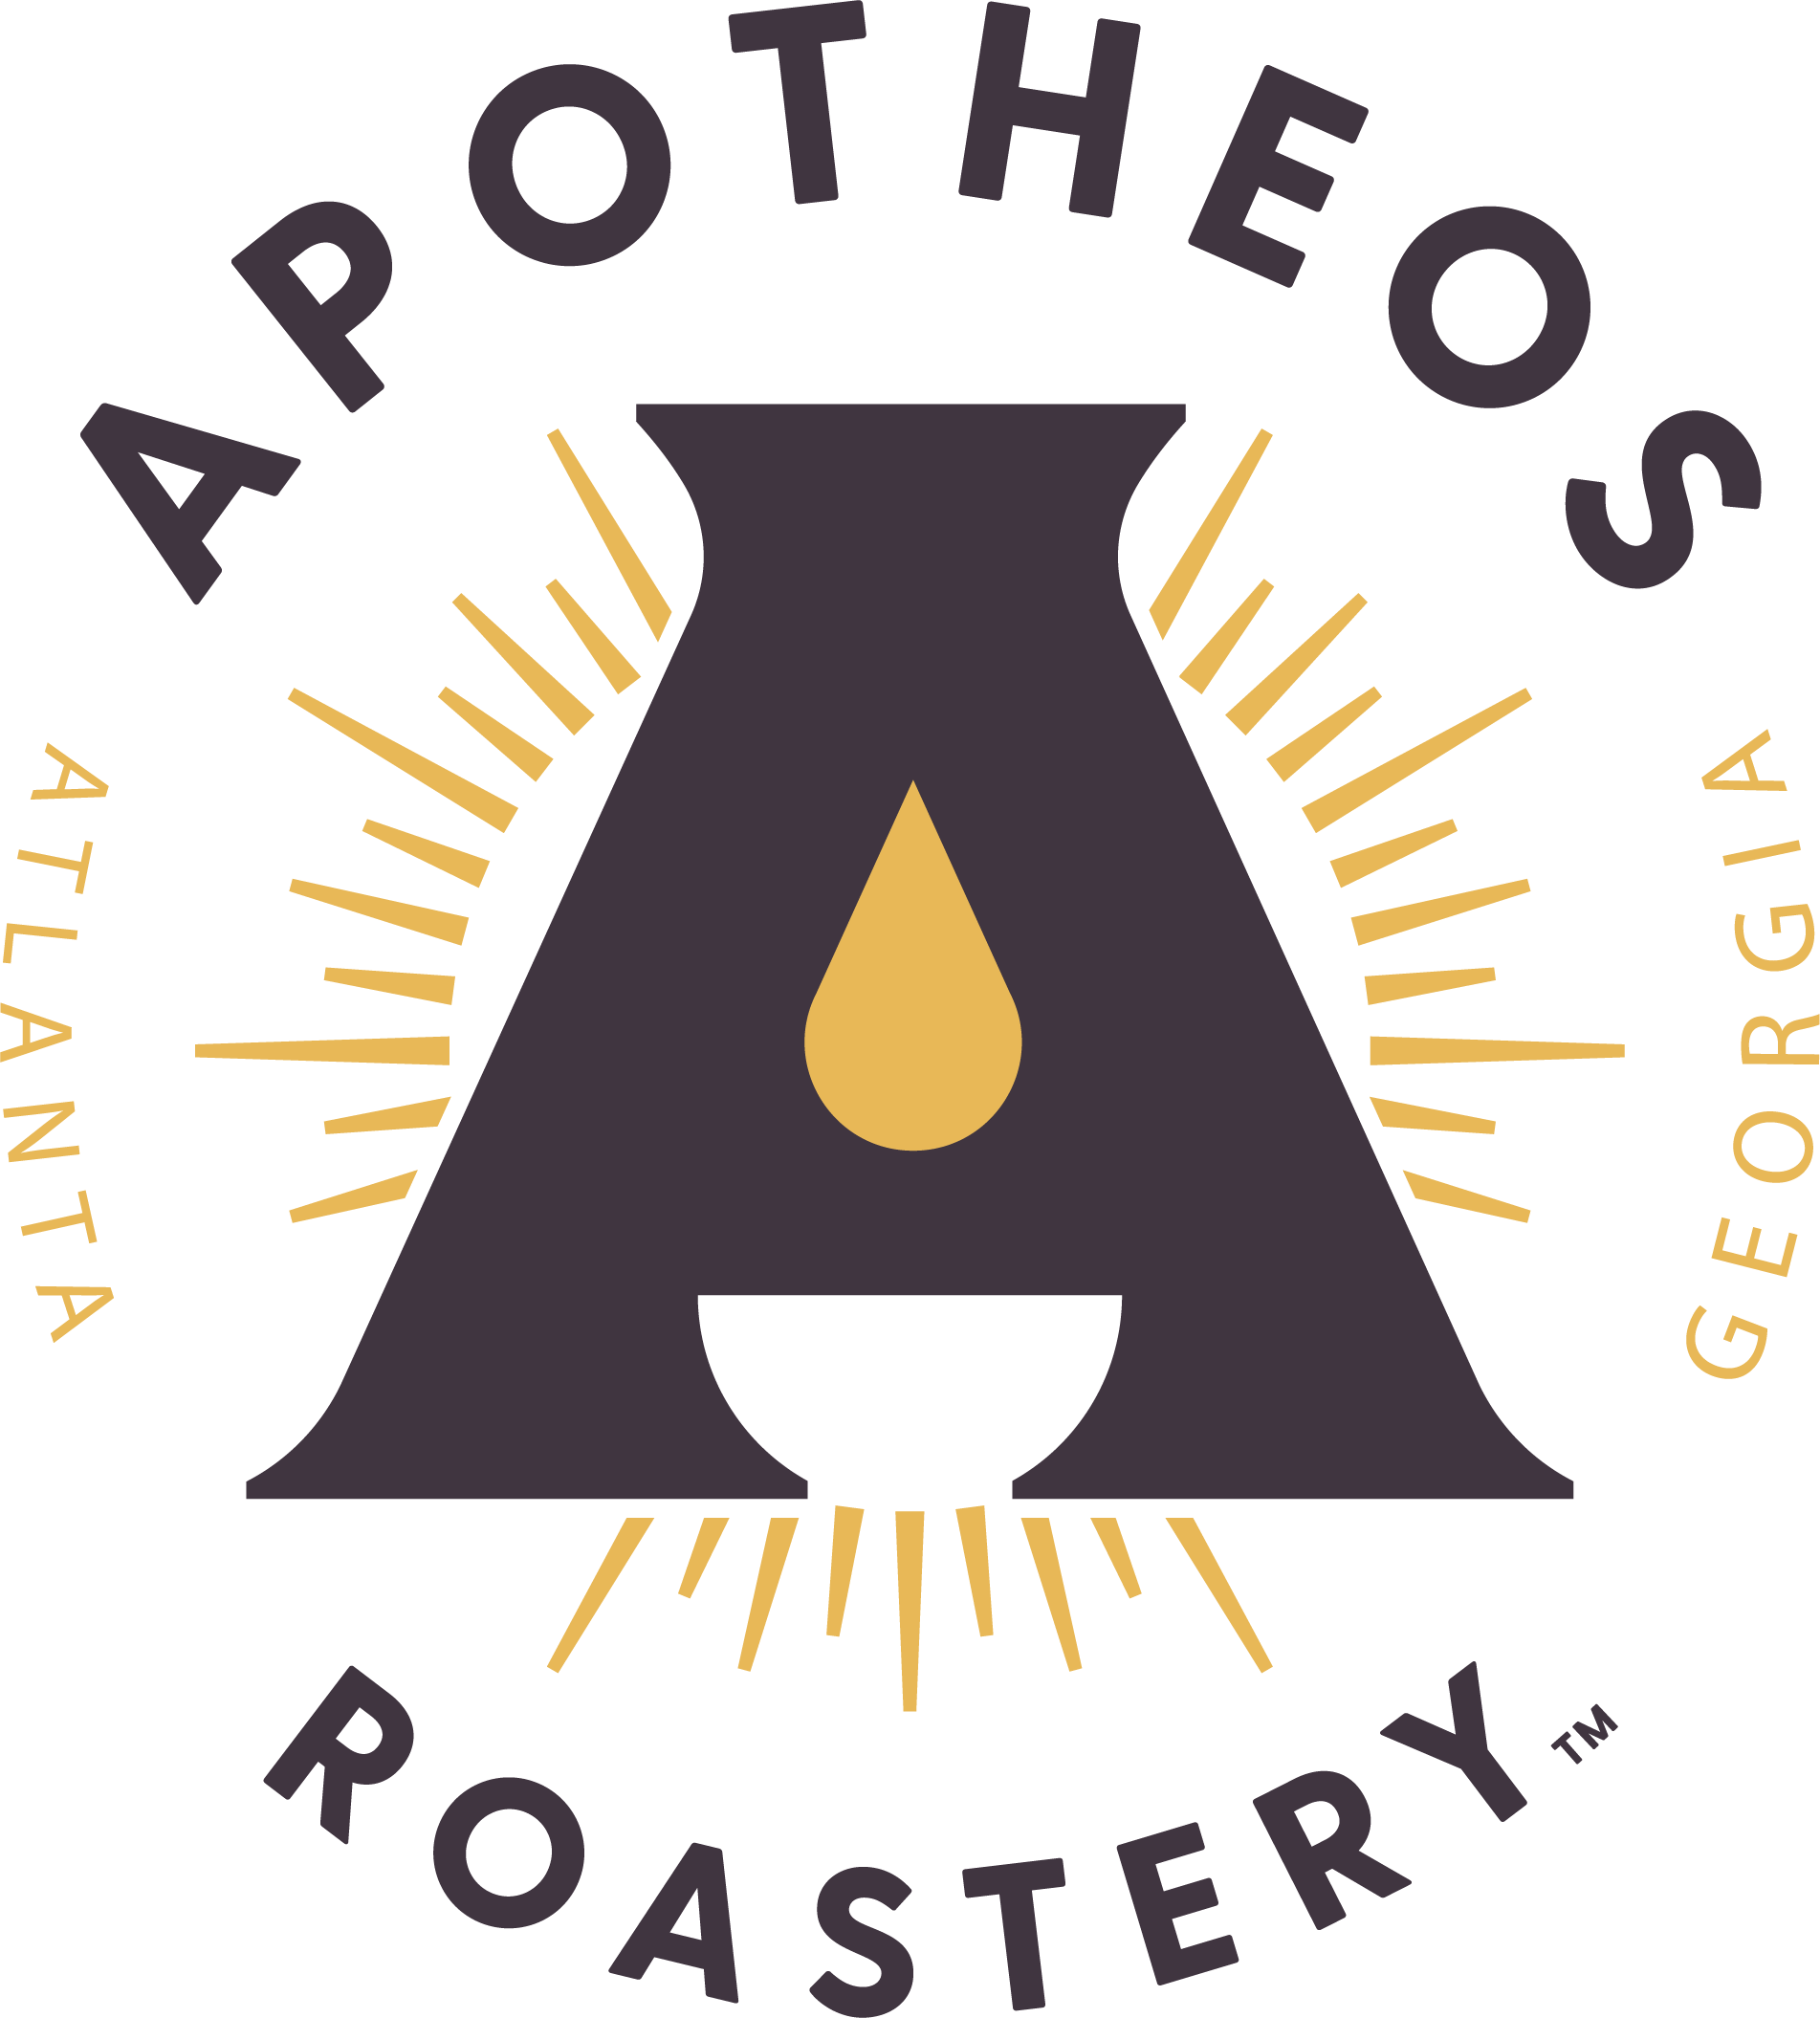 Apotheos Coffee Roastery brand identity design